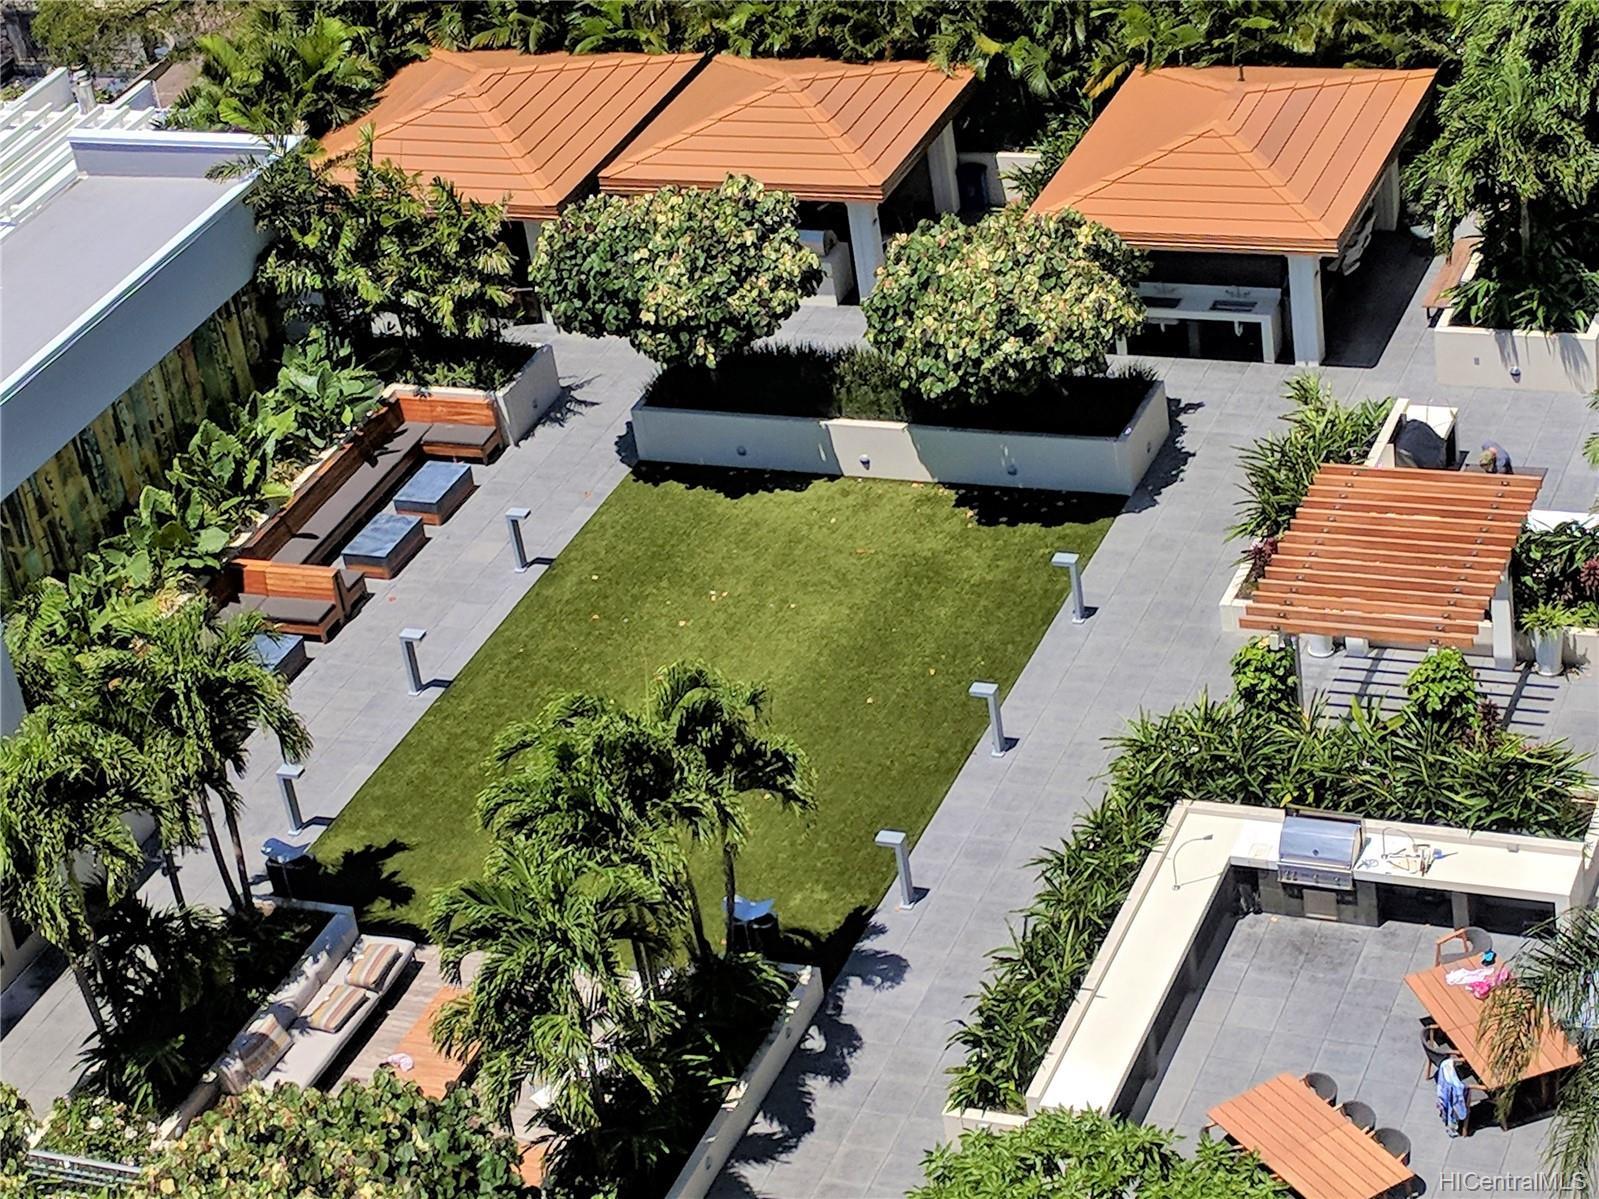 600 Ala Moana Blvd Honolulu - Rental - photo 25 of 25